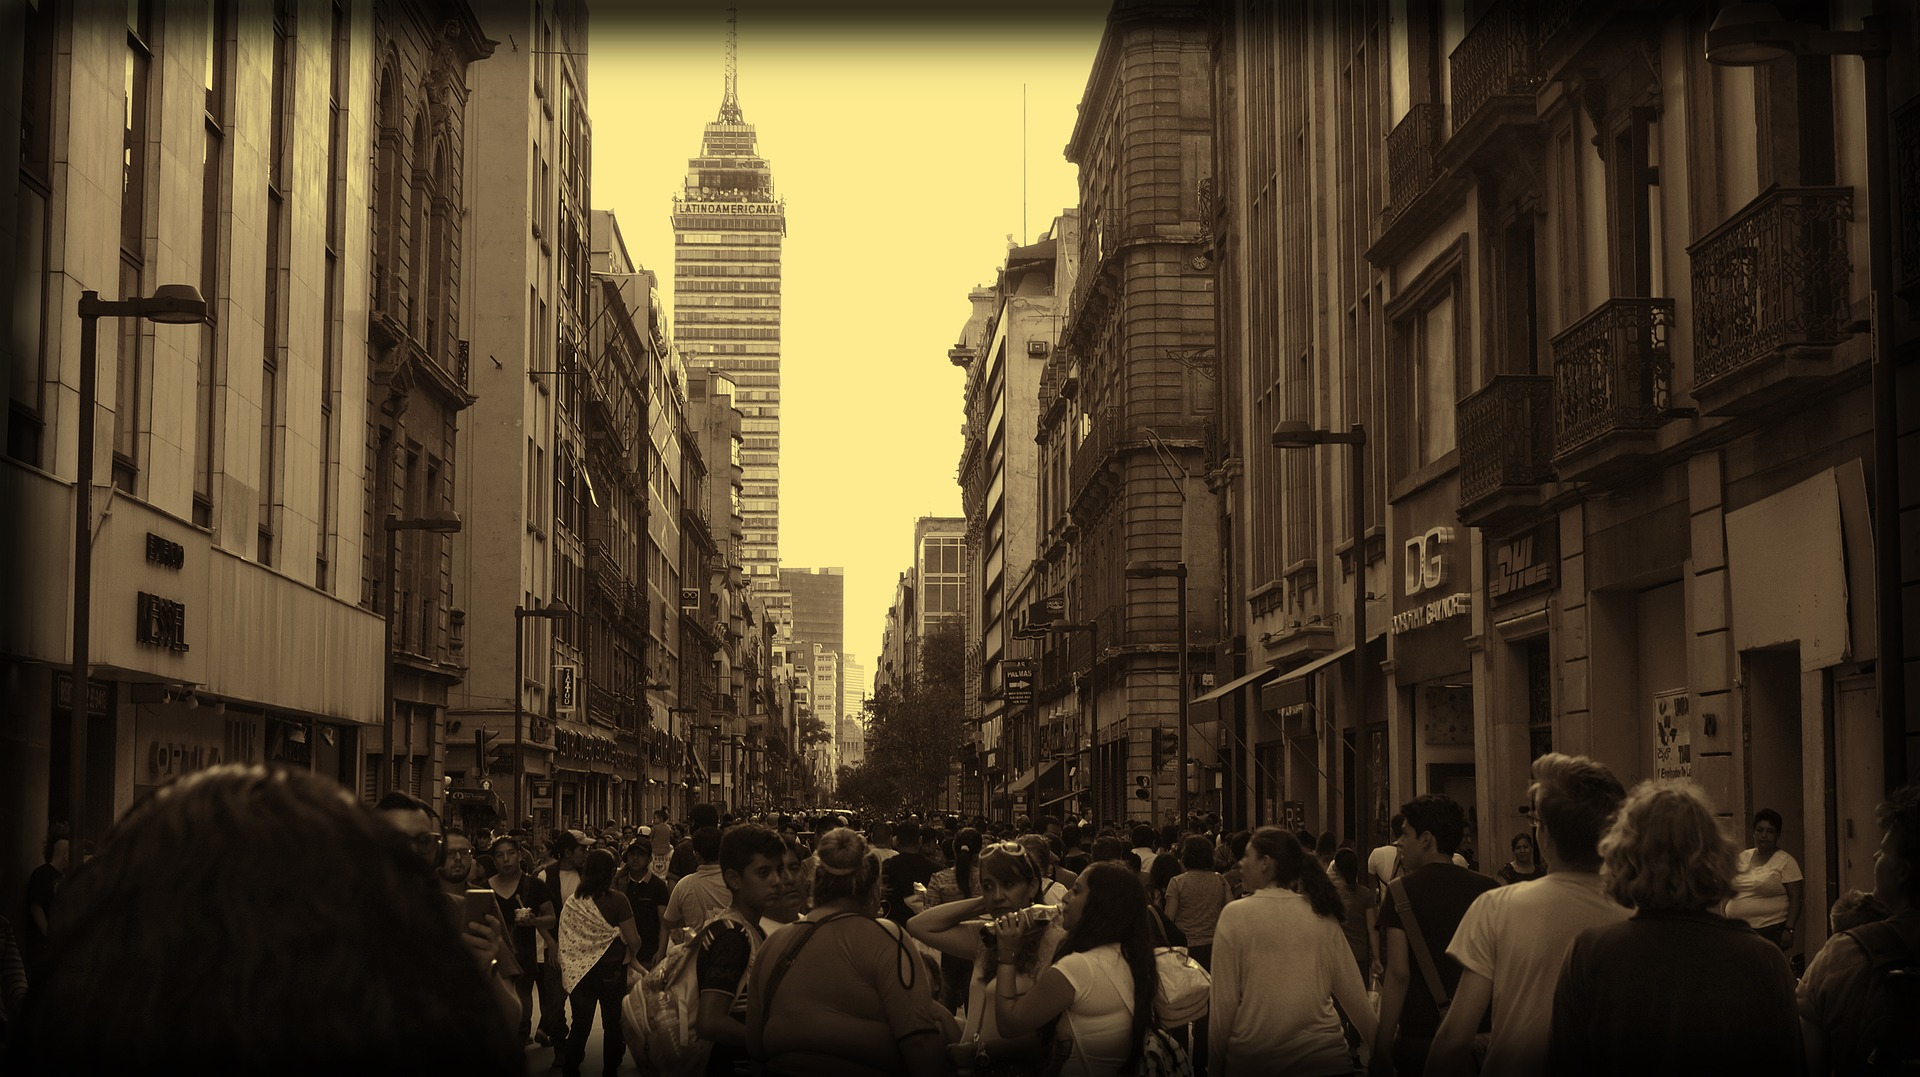 mexico-city-2706607_1920